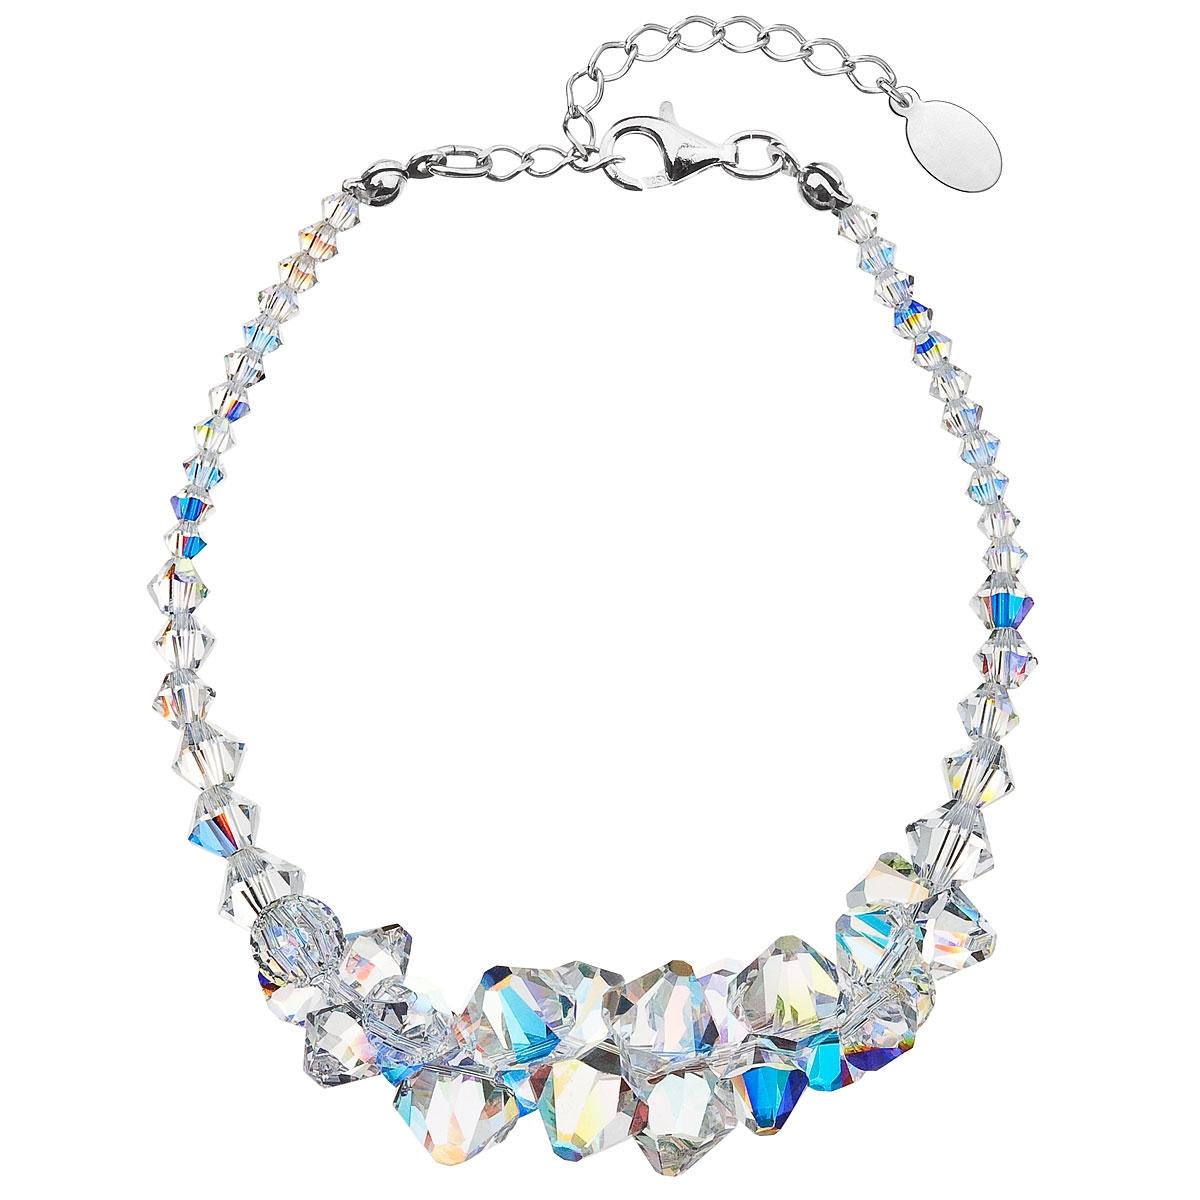 Stříbrný náramek s krystaly Crystals from Swarovski® AB EG7009-AB